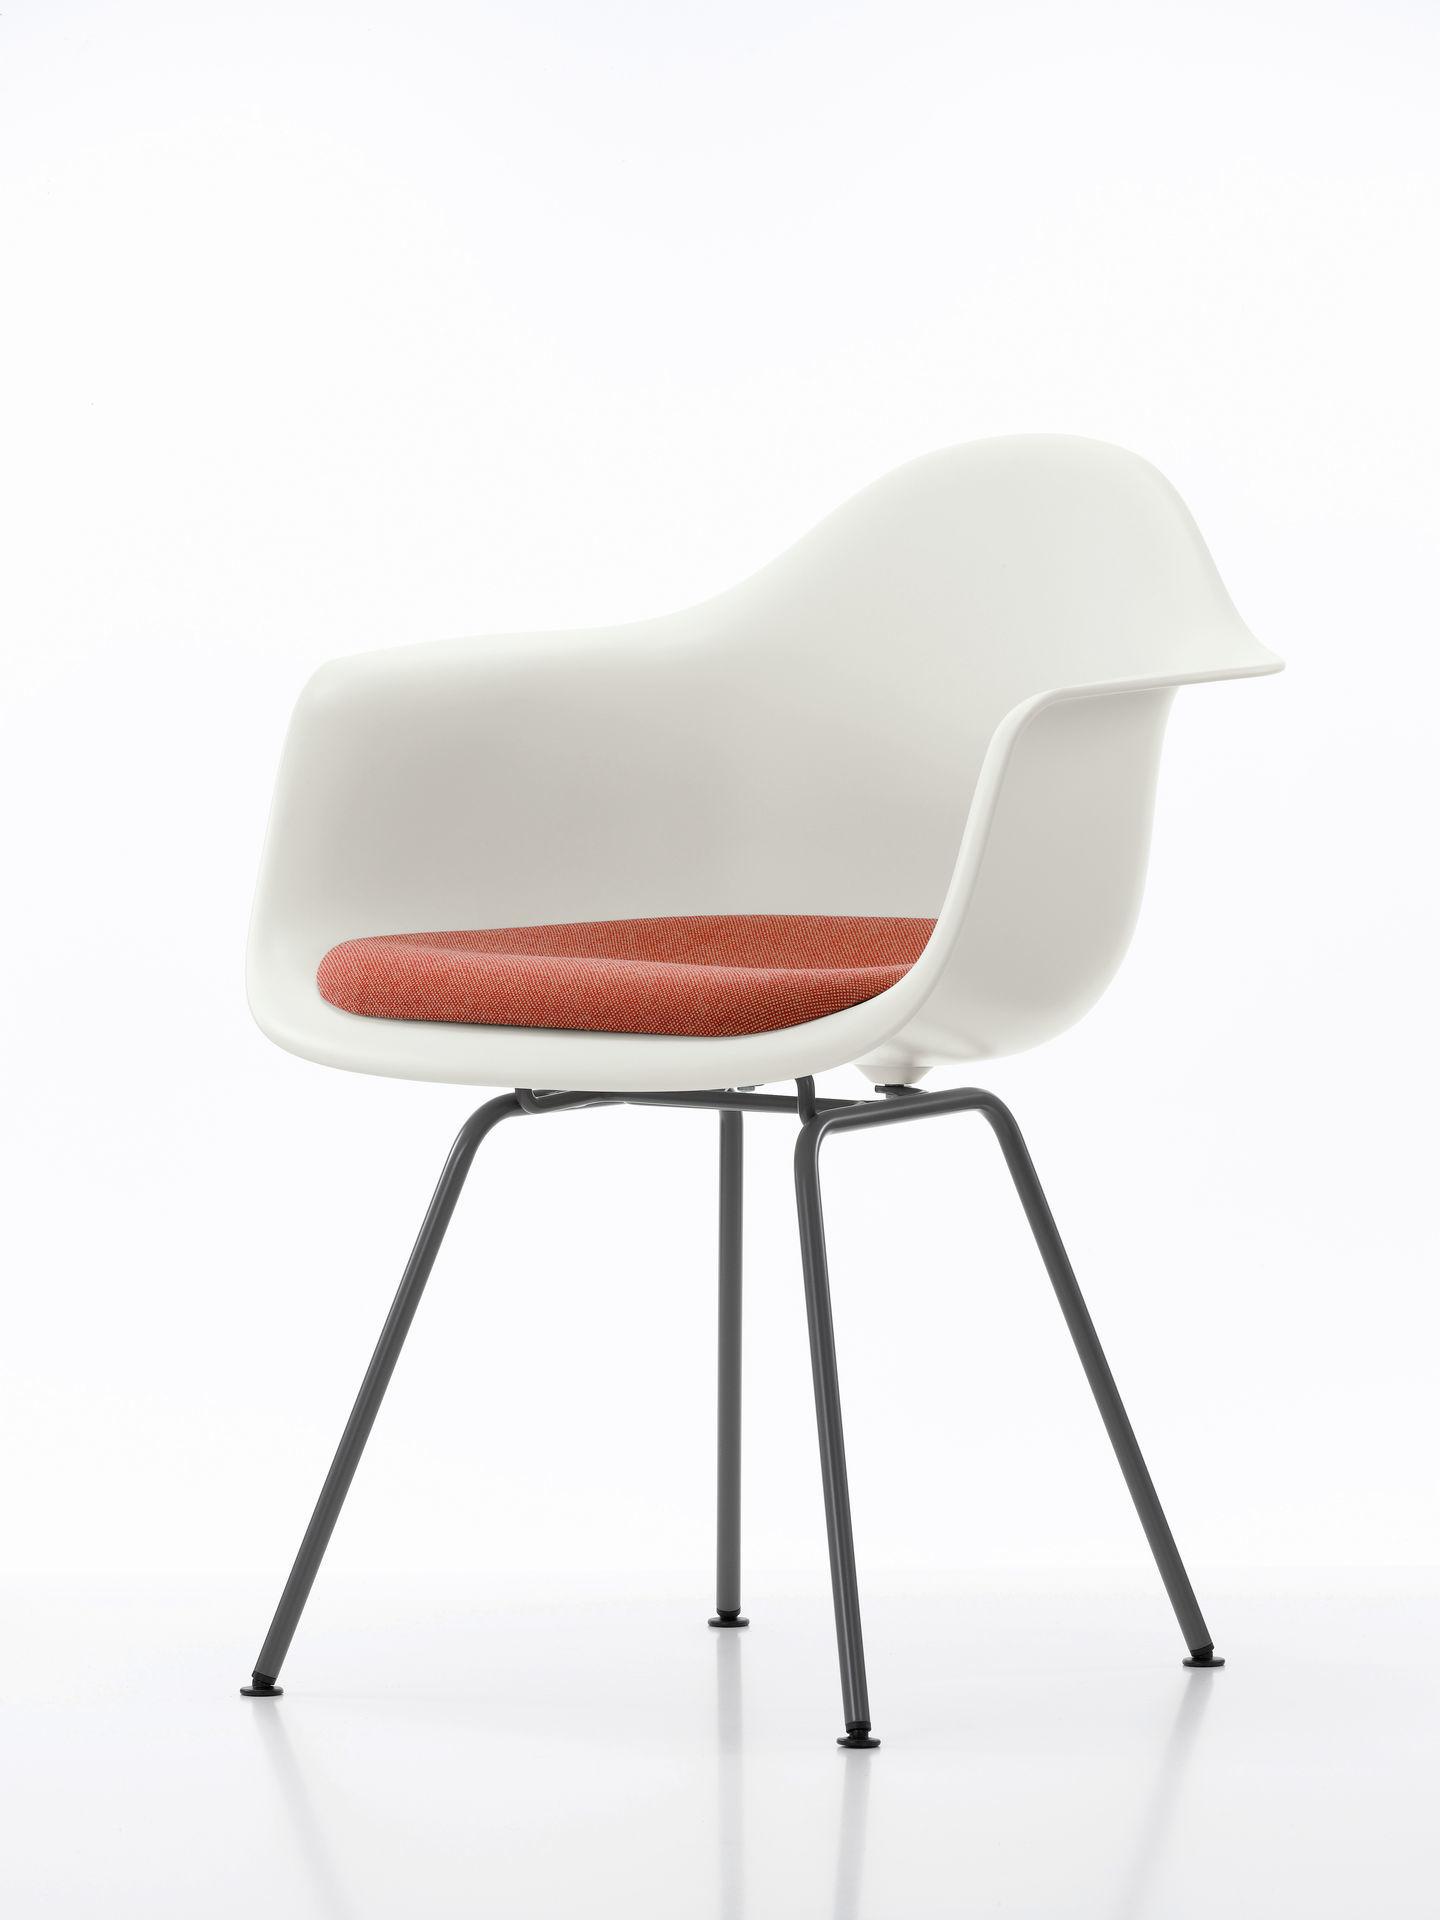 Eames Plastic Arm Chair DAX mit Sitzpolster Vitra